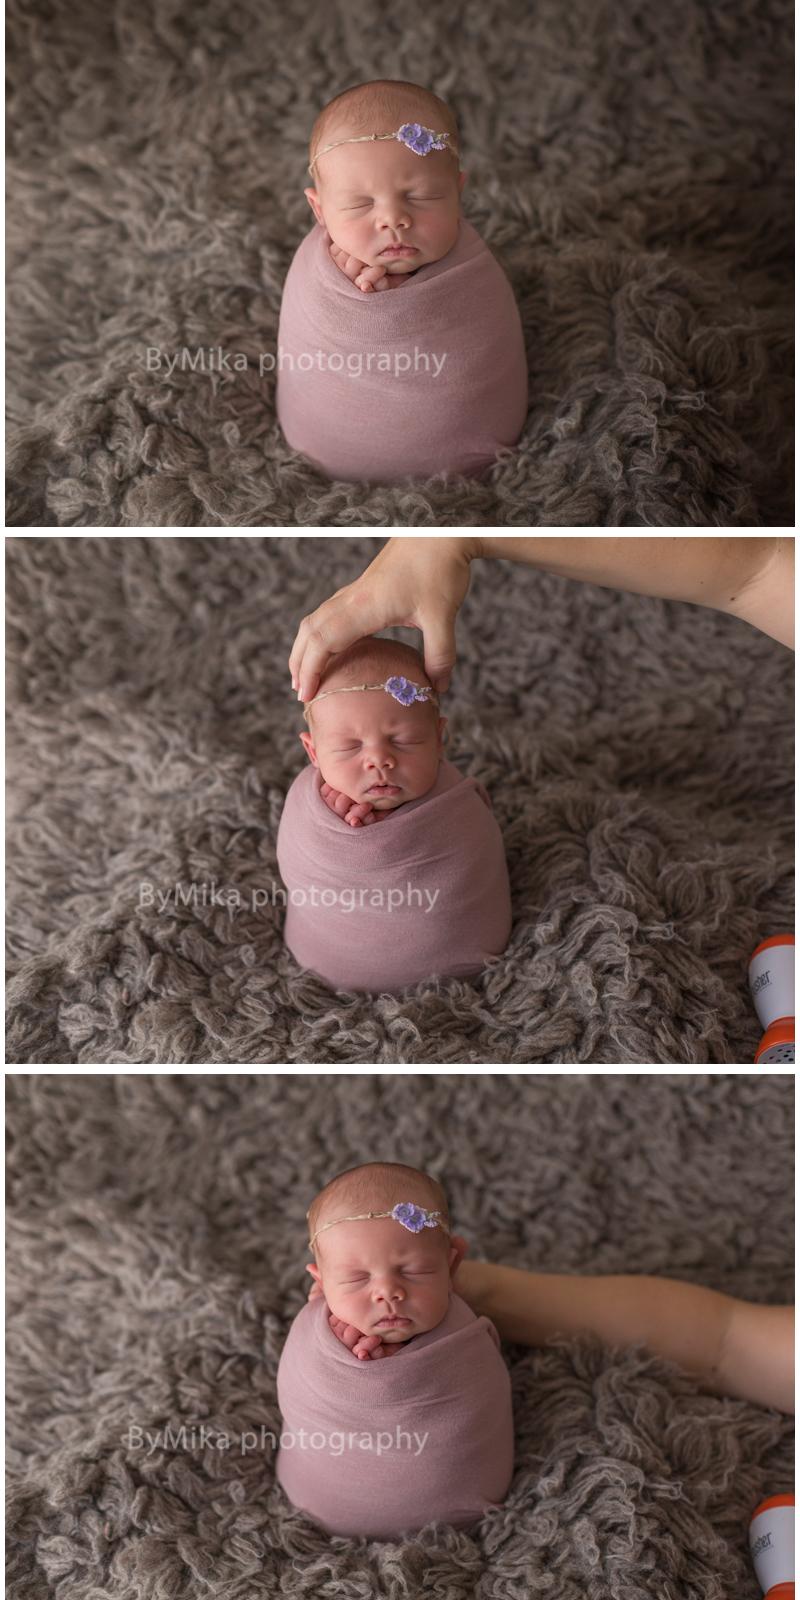 Newborn photo composite